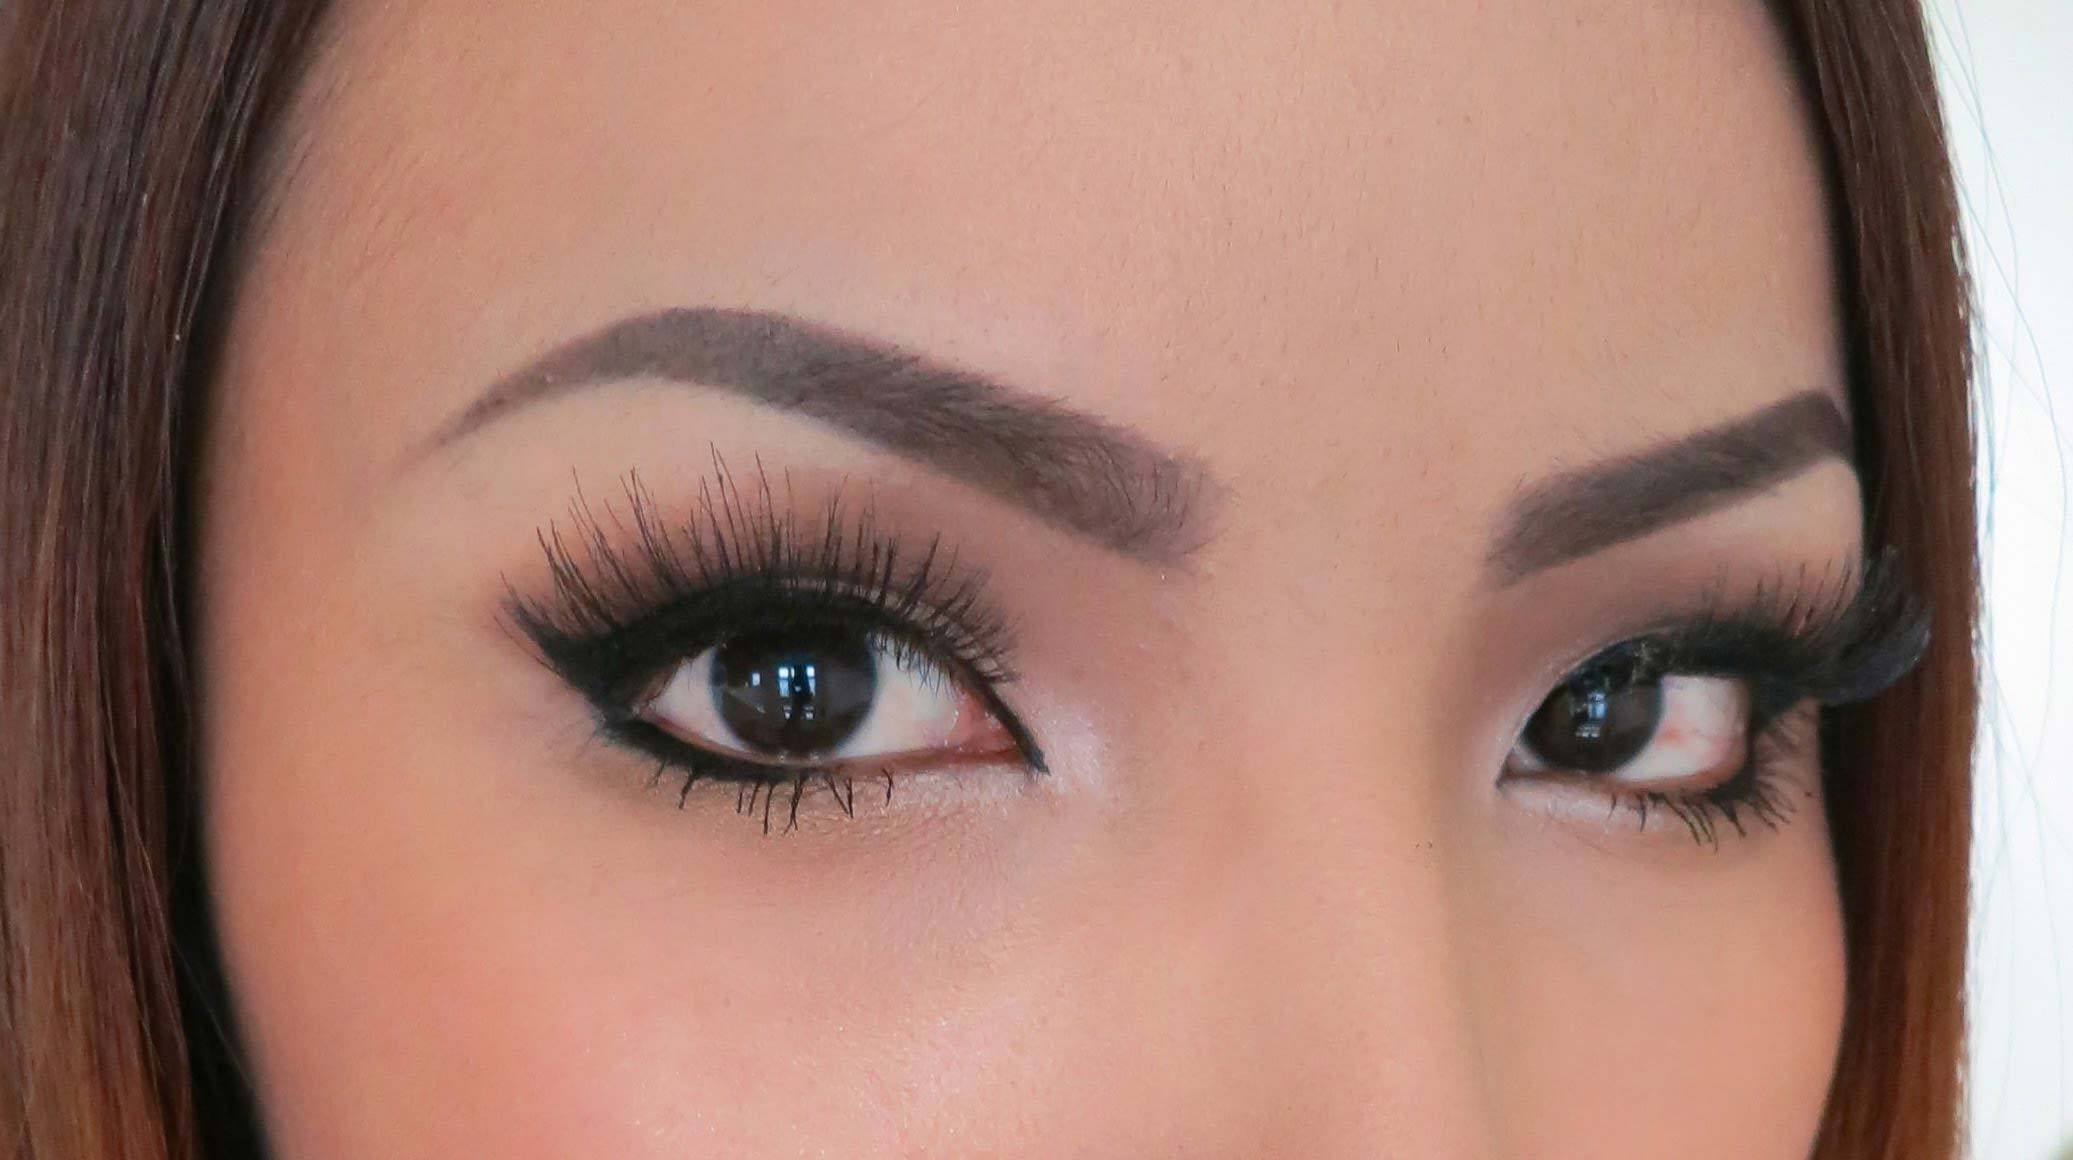 Botulinum Toxin and Eyebrow Asymmetry